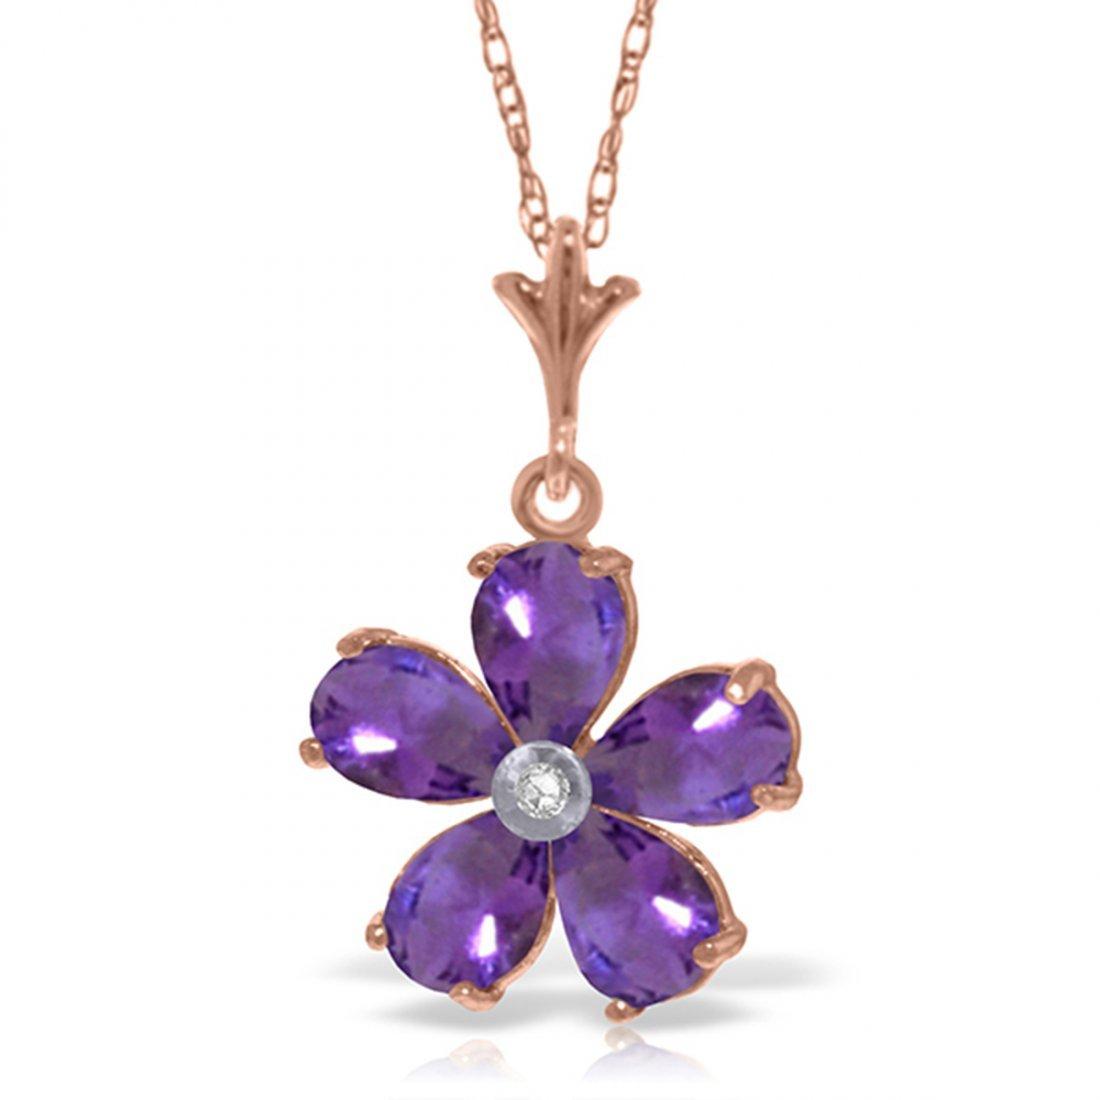 Genuine 2.22 ctw Amethyst & Diamond Necklace Jewelry